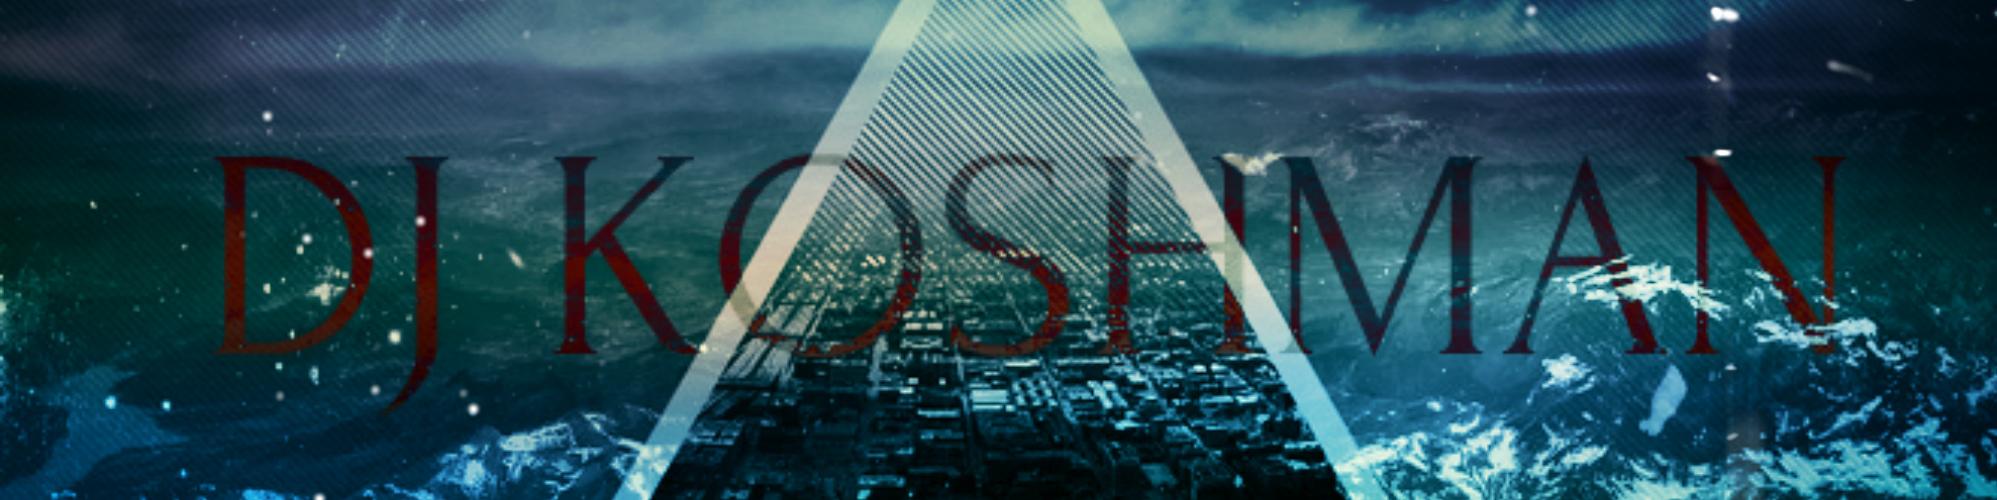 Aryar - Overwhelmed (DJ Koshman remix) – DJ Koshman 5a01c09f8cb6a